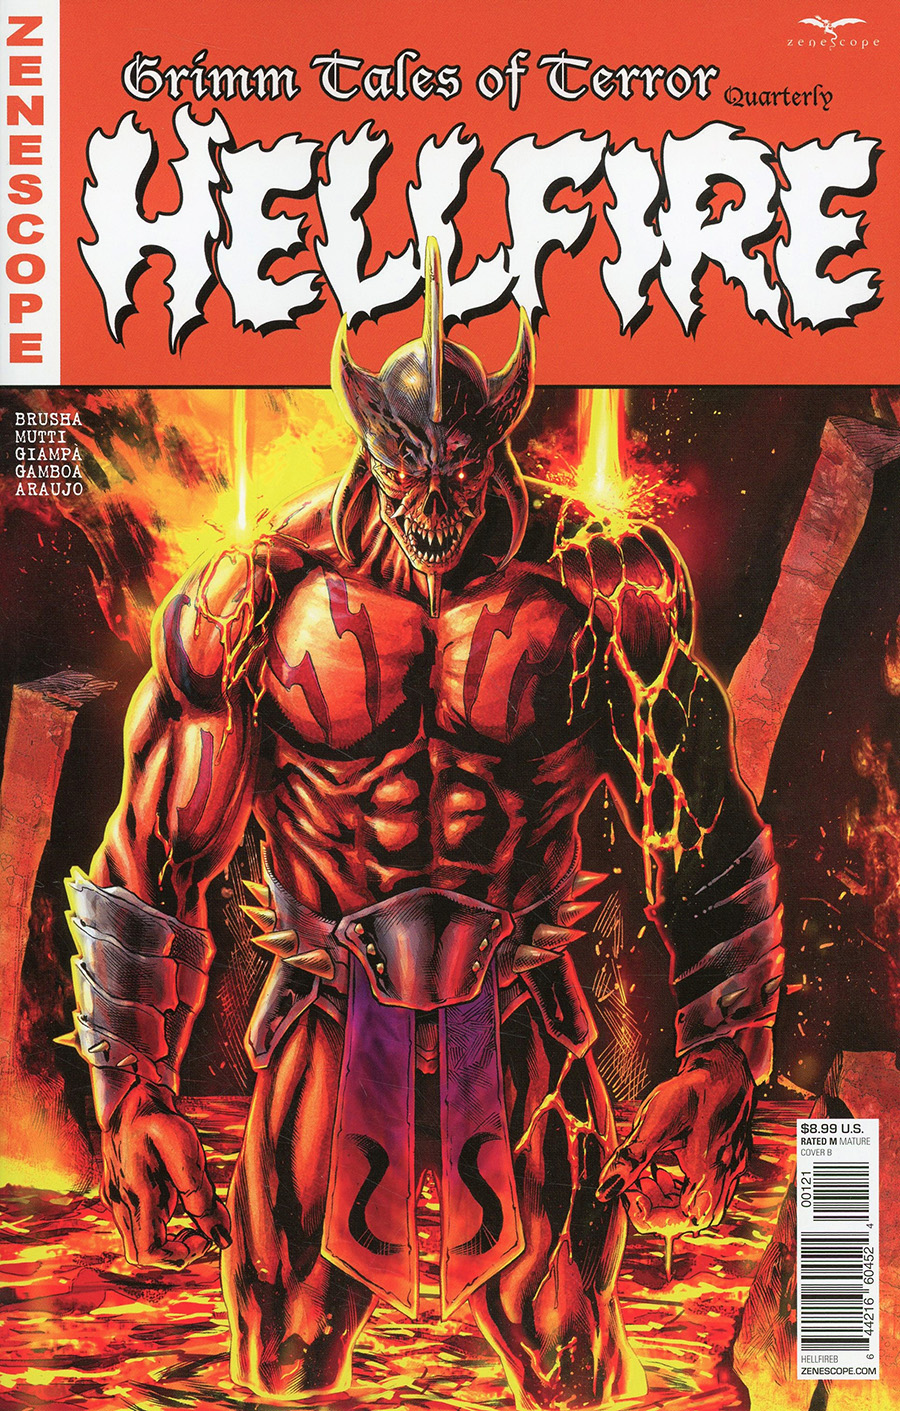 Grimm Fairy Tales Presents Grimm Tales Of Terror Quarterly #1 Hellfire Cover B Igor Vitorino